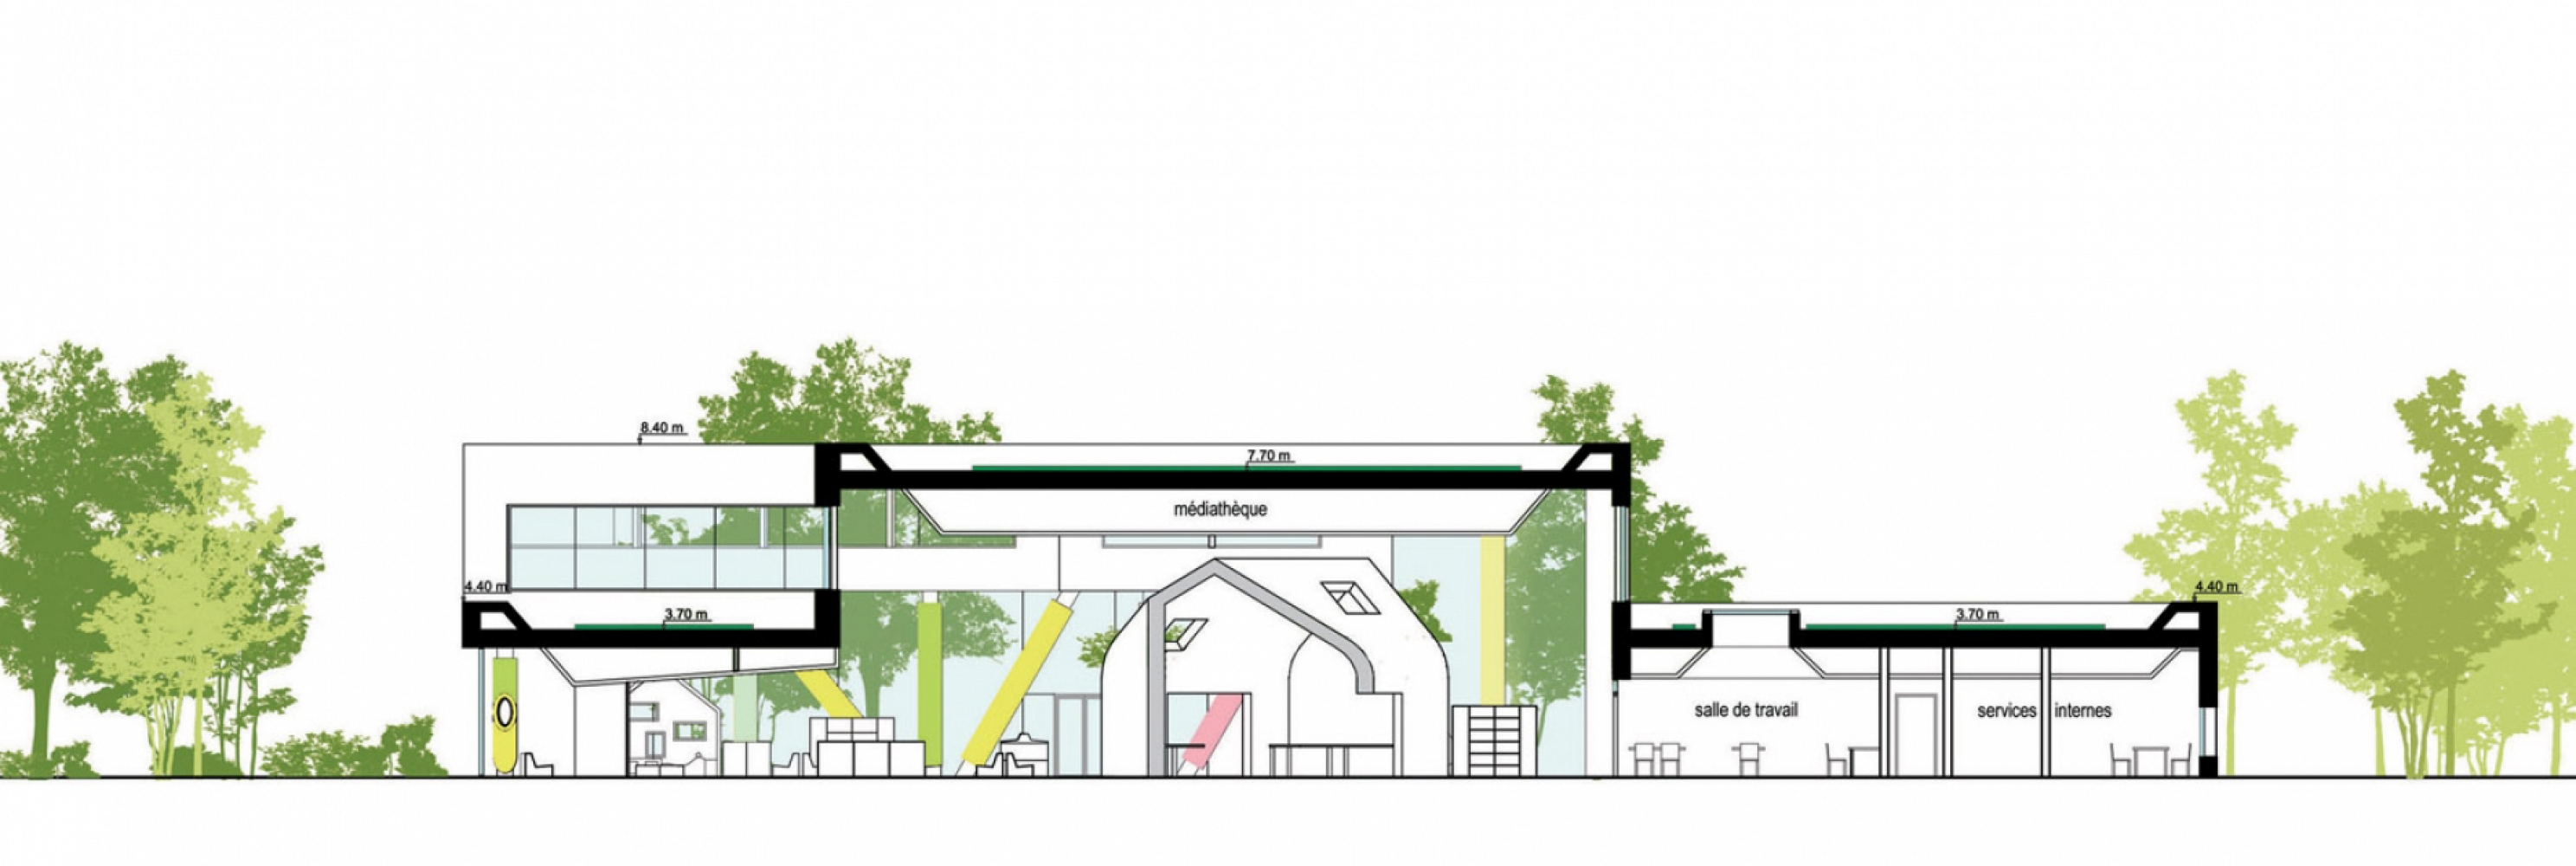 harnes01 Pascale SEURIN Architecte - Pascale SEURIN Architecte